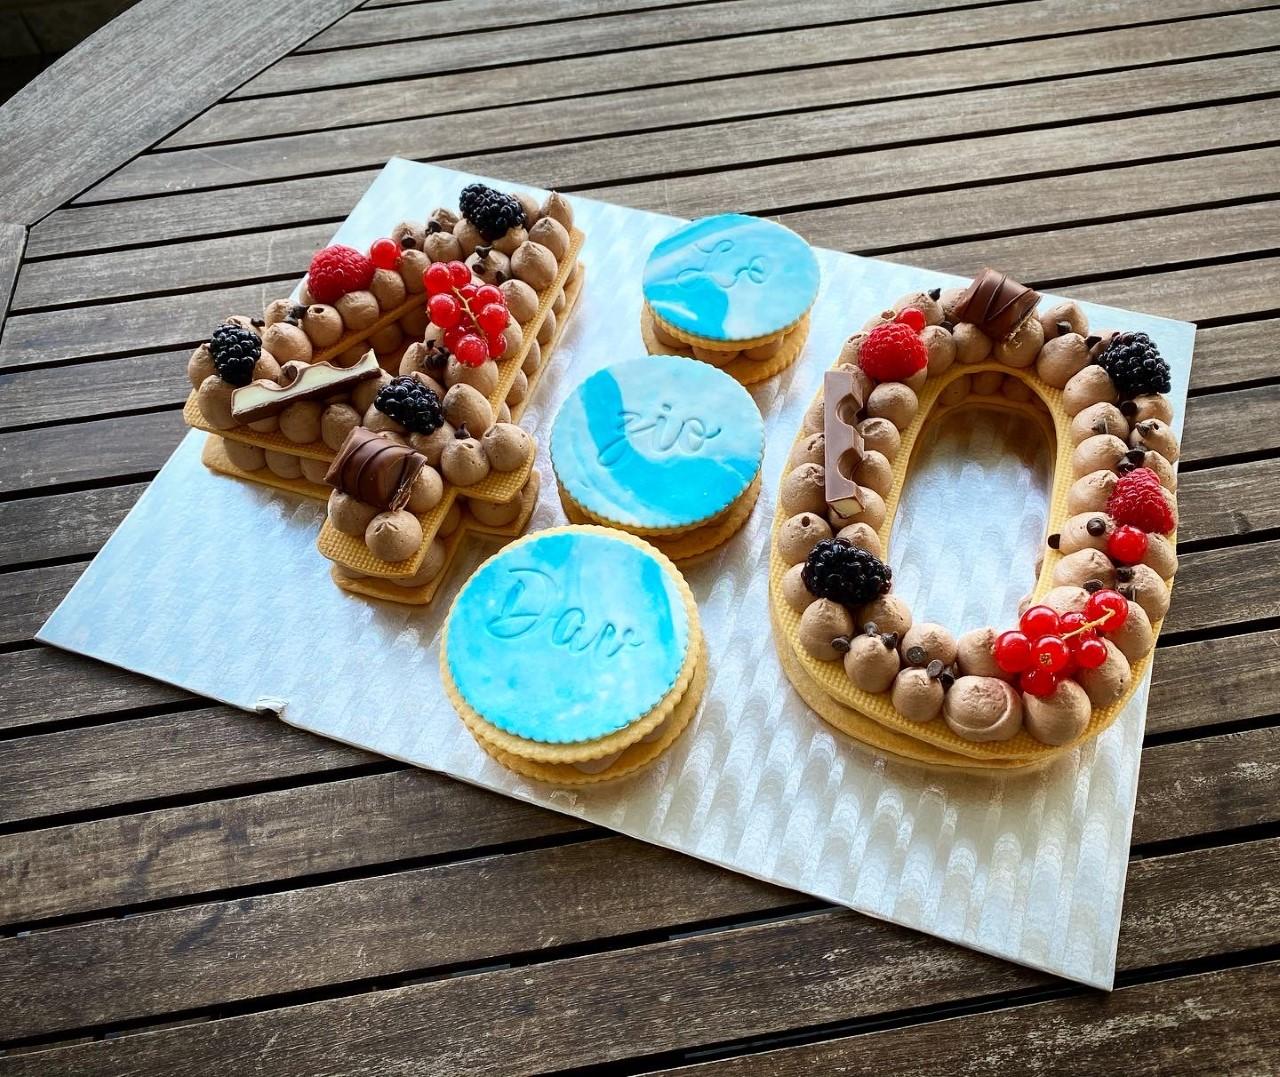 Cream tart 40 anni compleanno